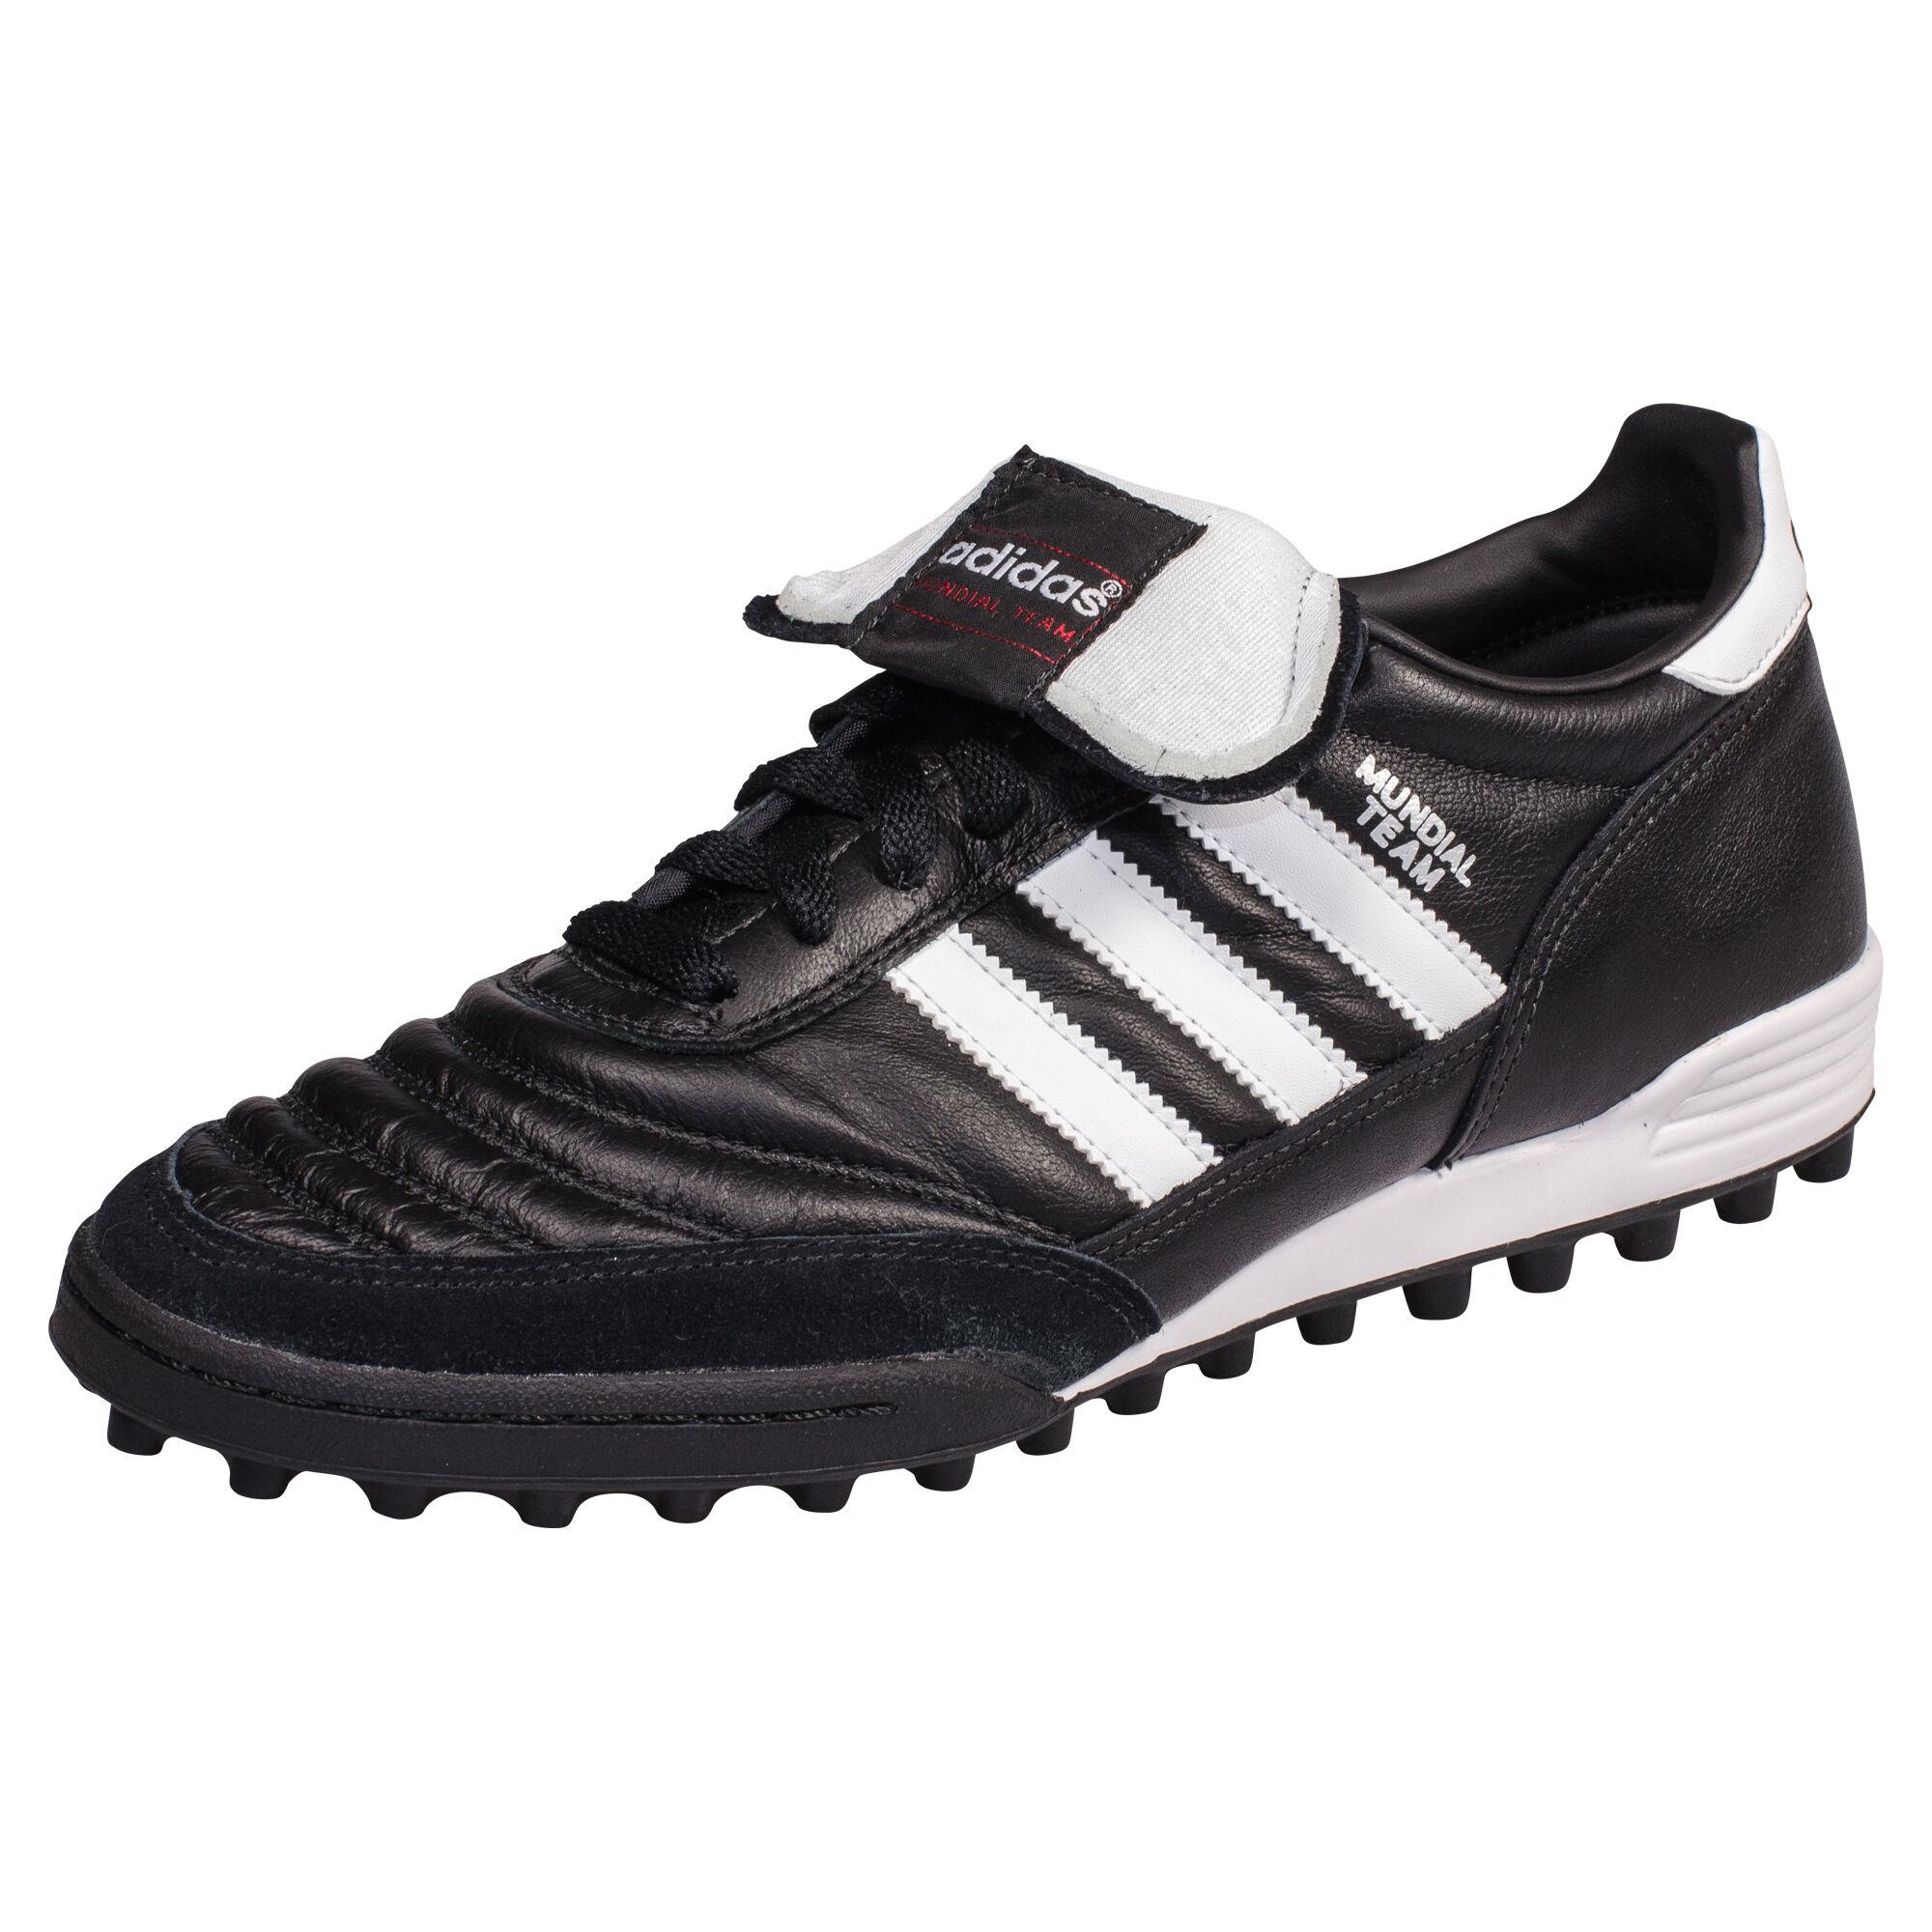 Größe 13 Schuhe Mjxjojn Deerupt Hpv1nawq Black Damen Runner